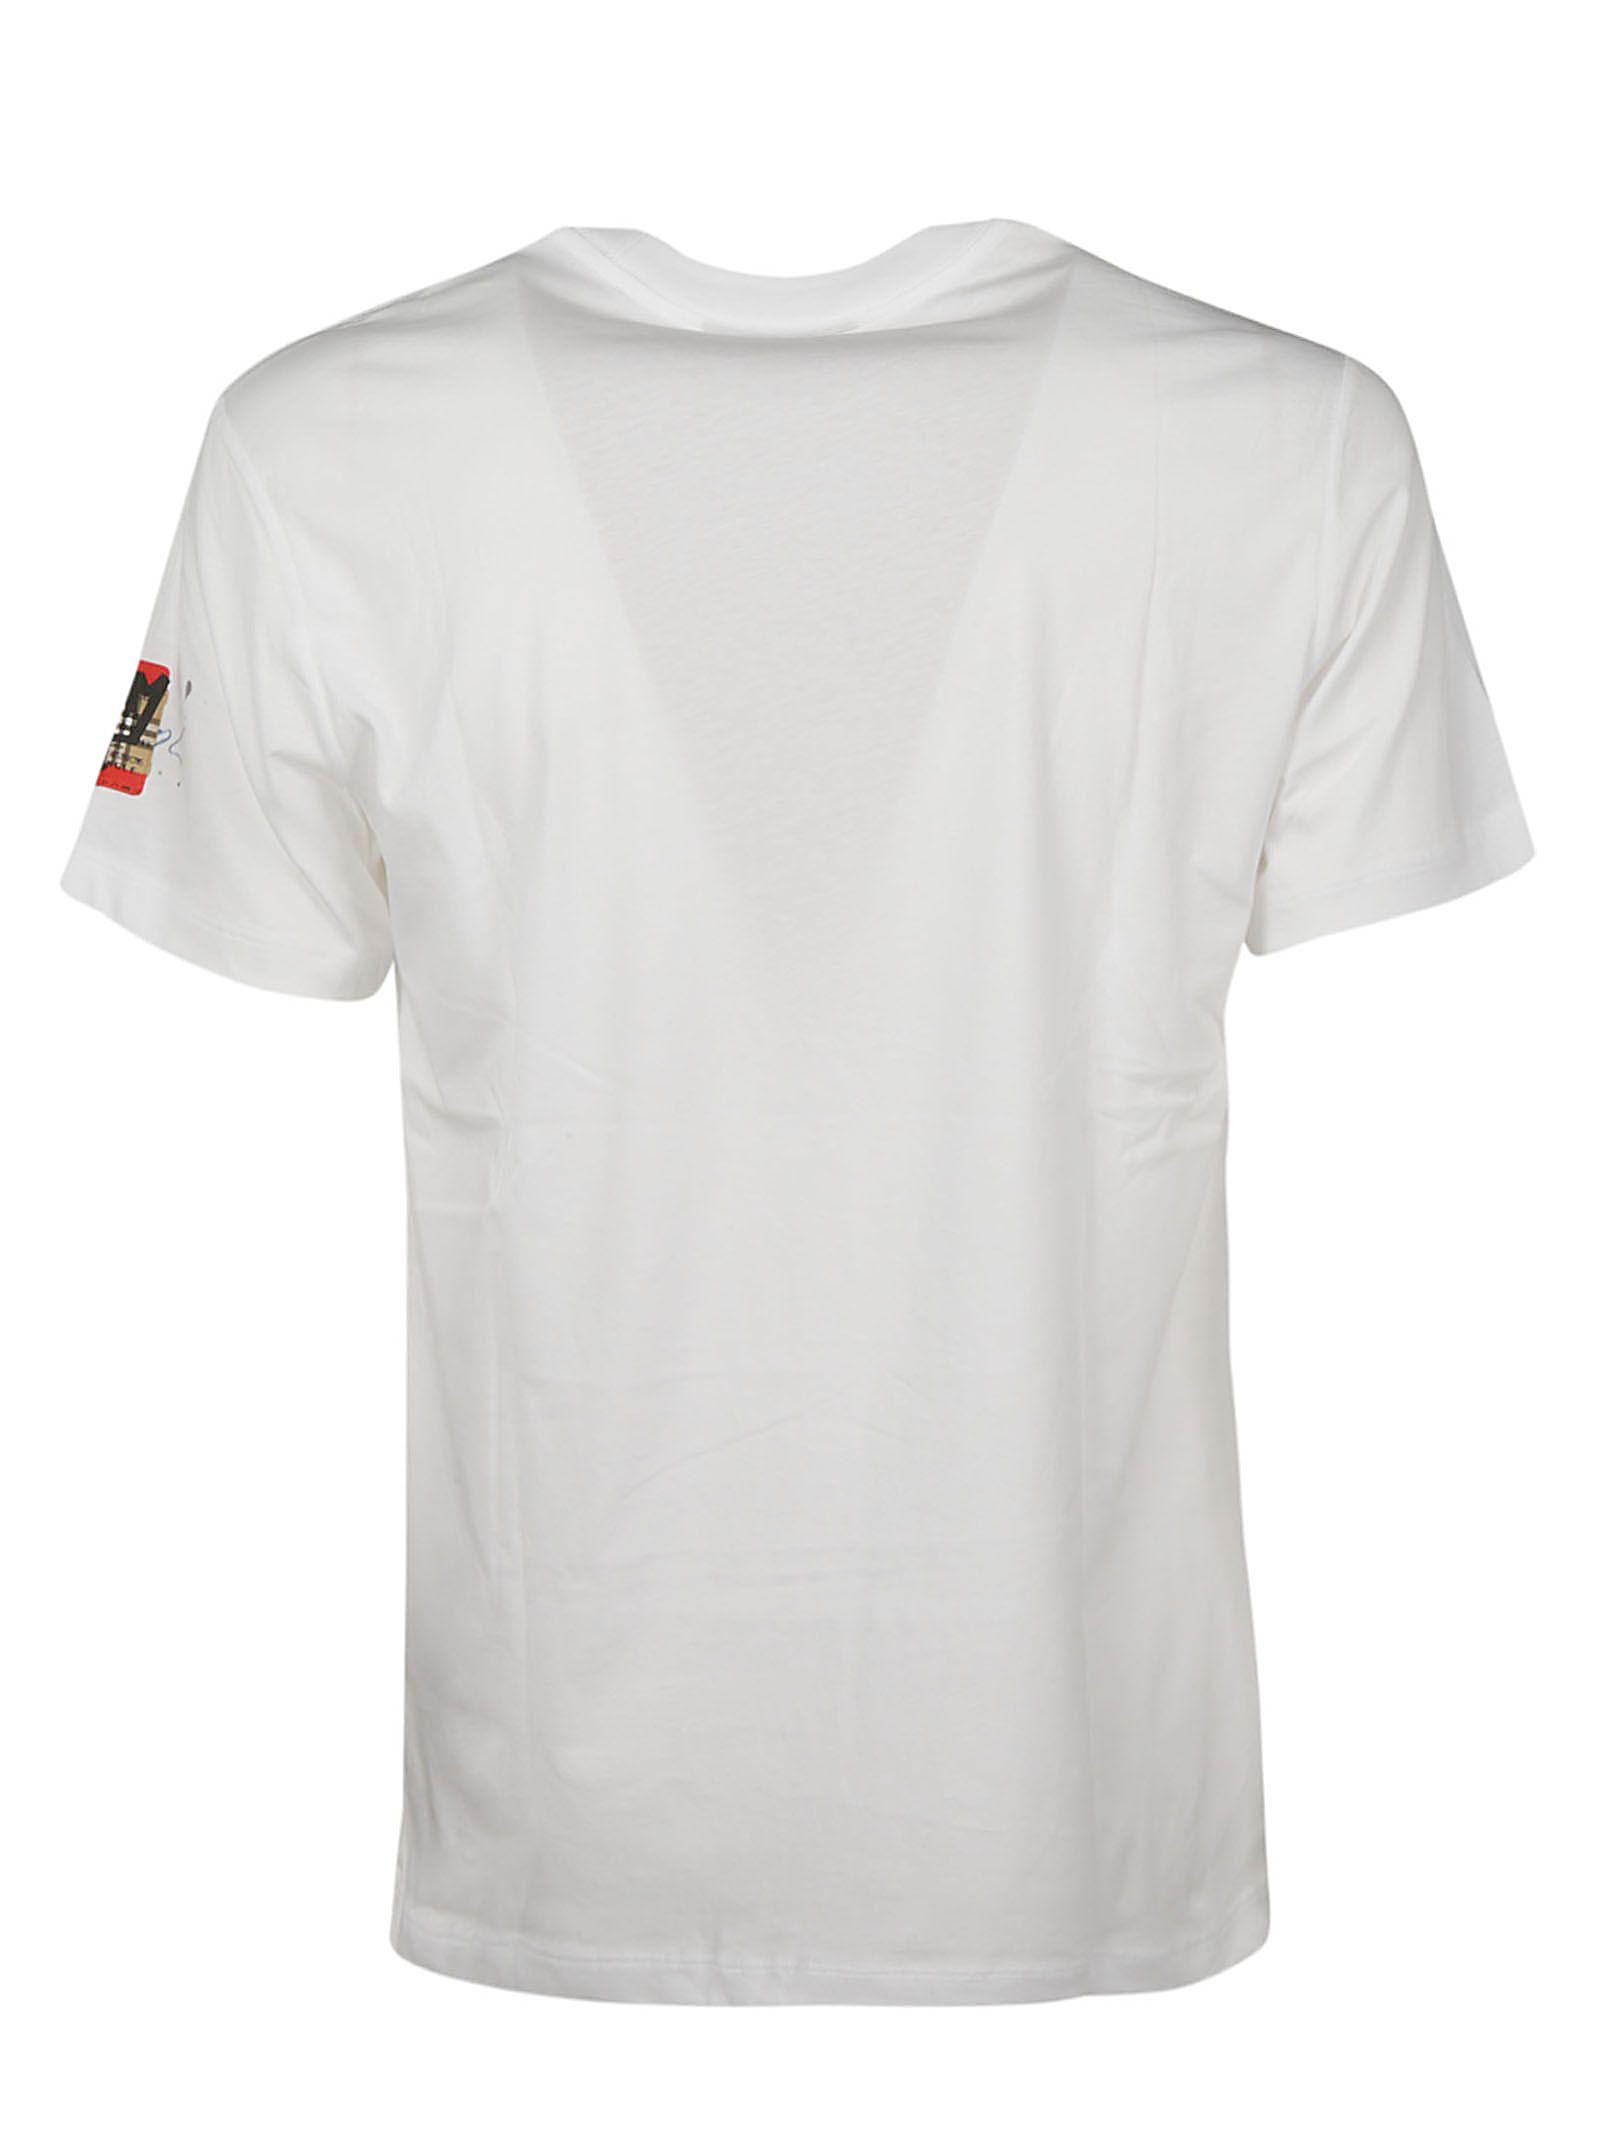 34f5120a5 Burberry Burberry Graffitied Ticket Print T-shirt - White - 10746299 ...